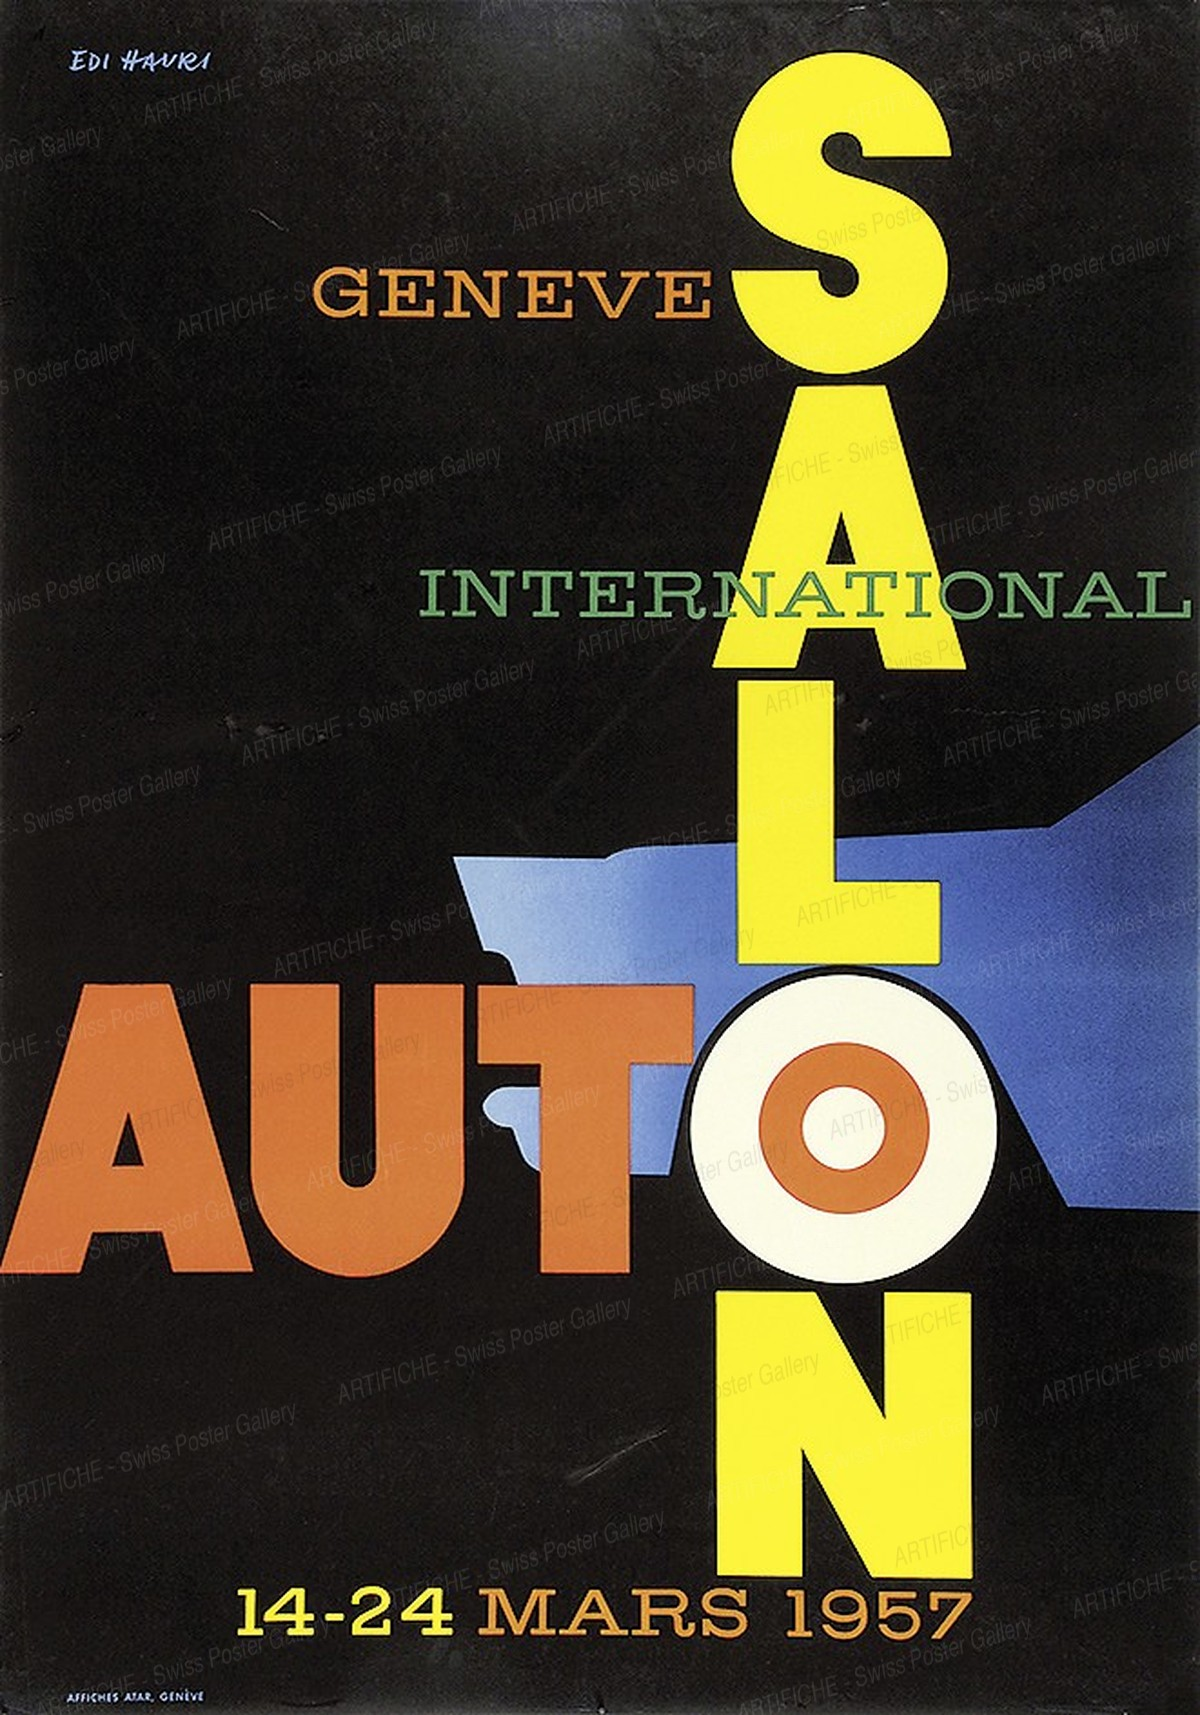 International Auto Salon Genève 1957, Edi Hauri